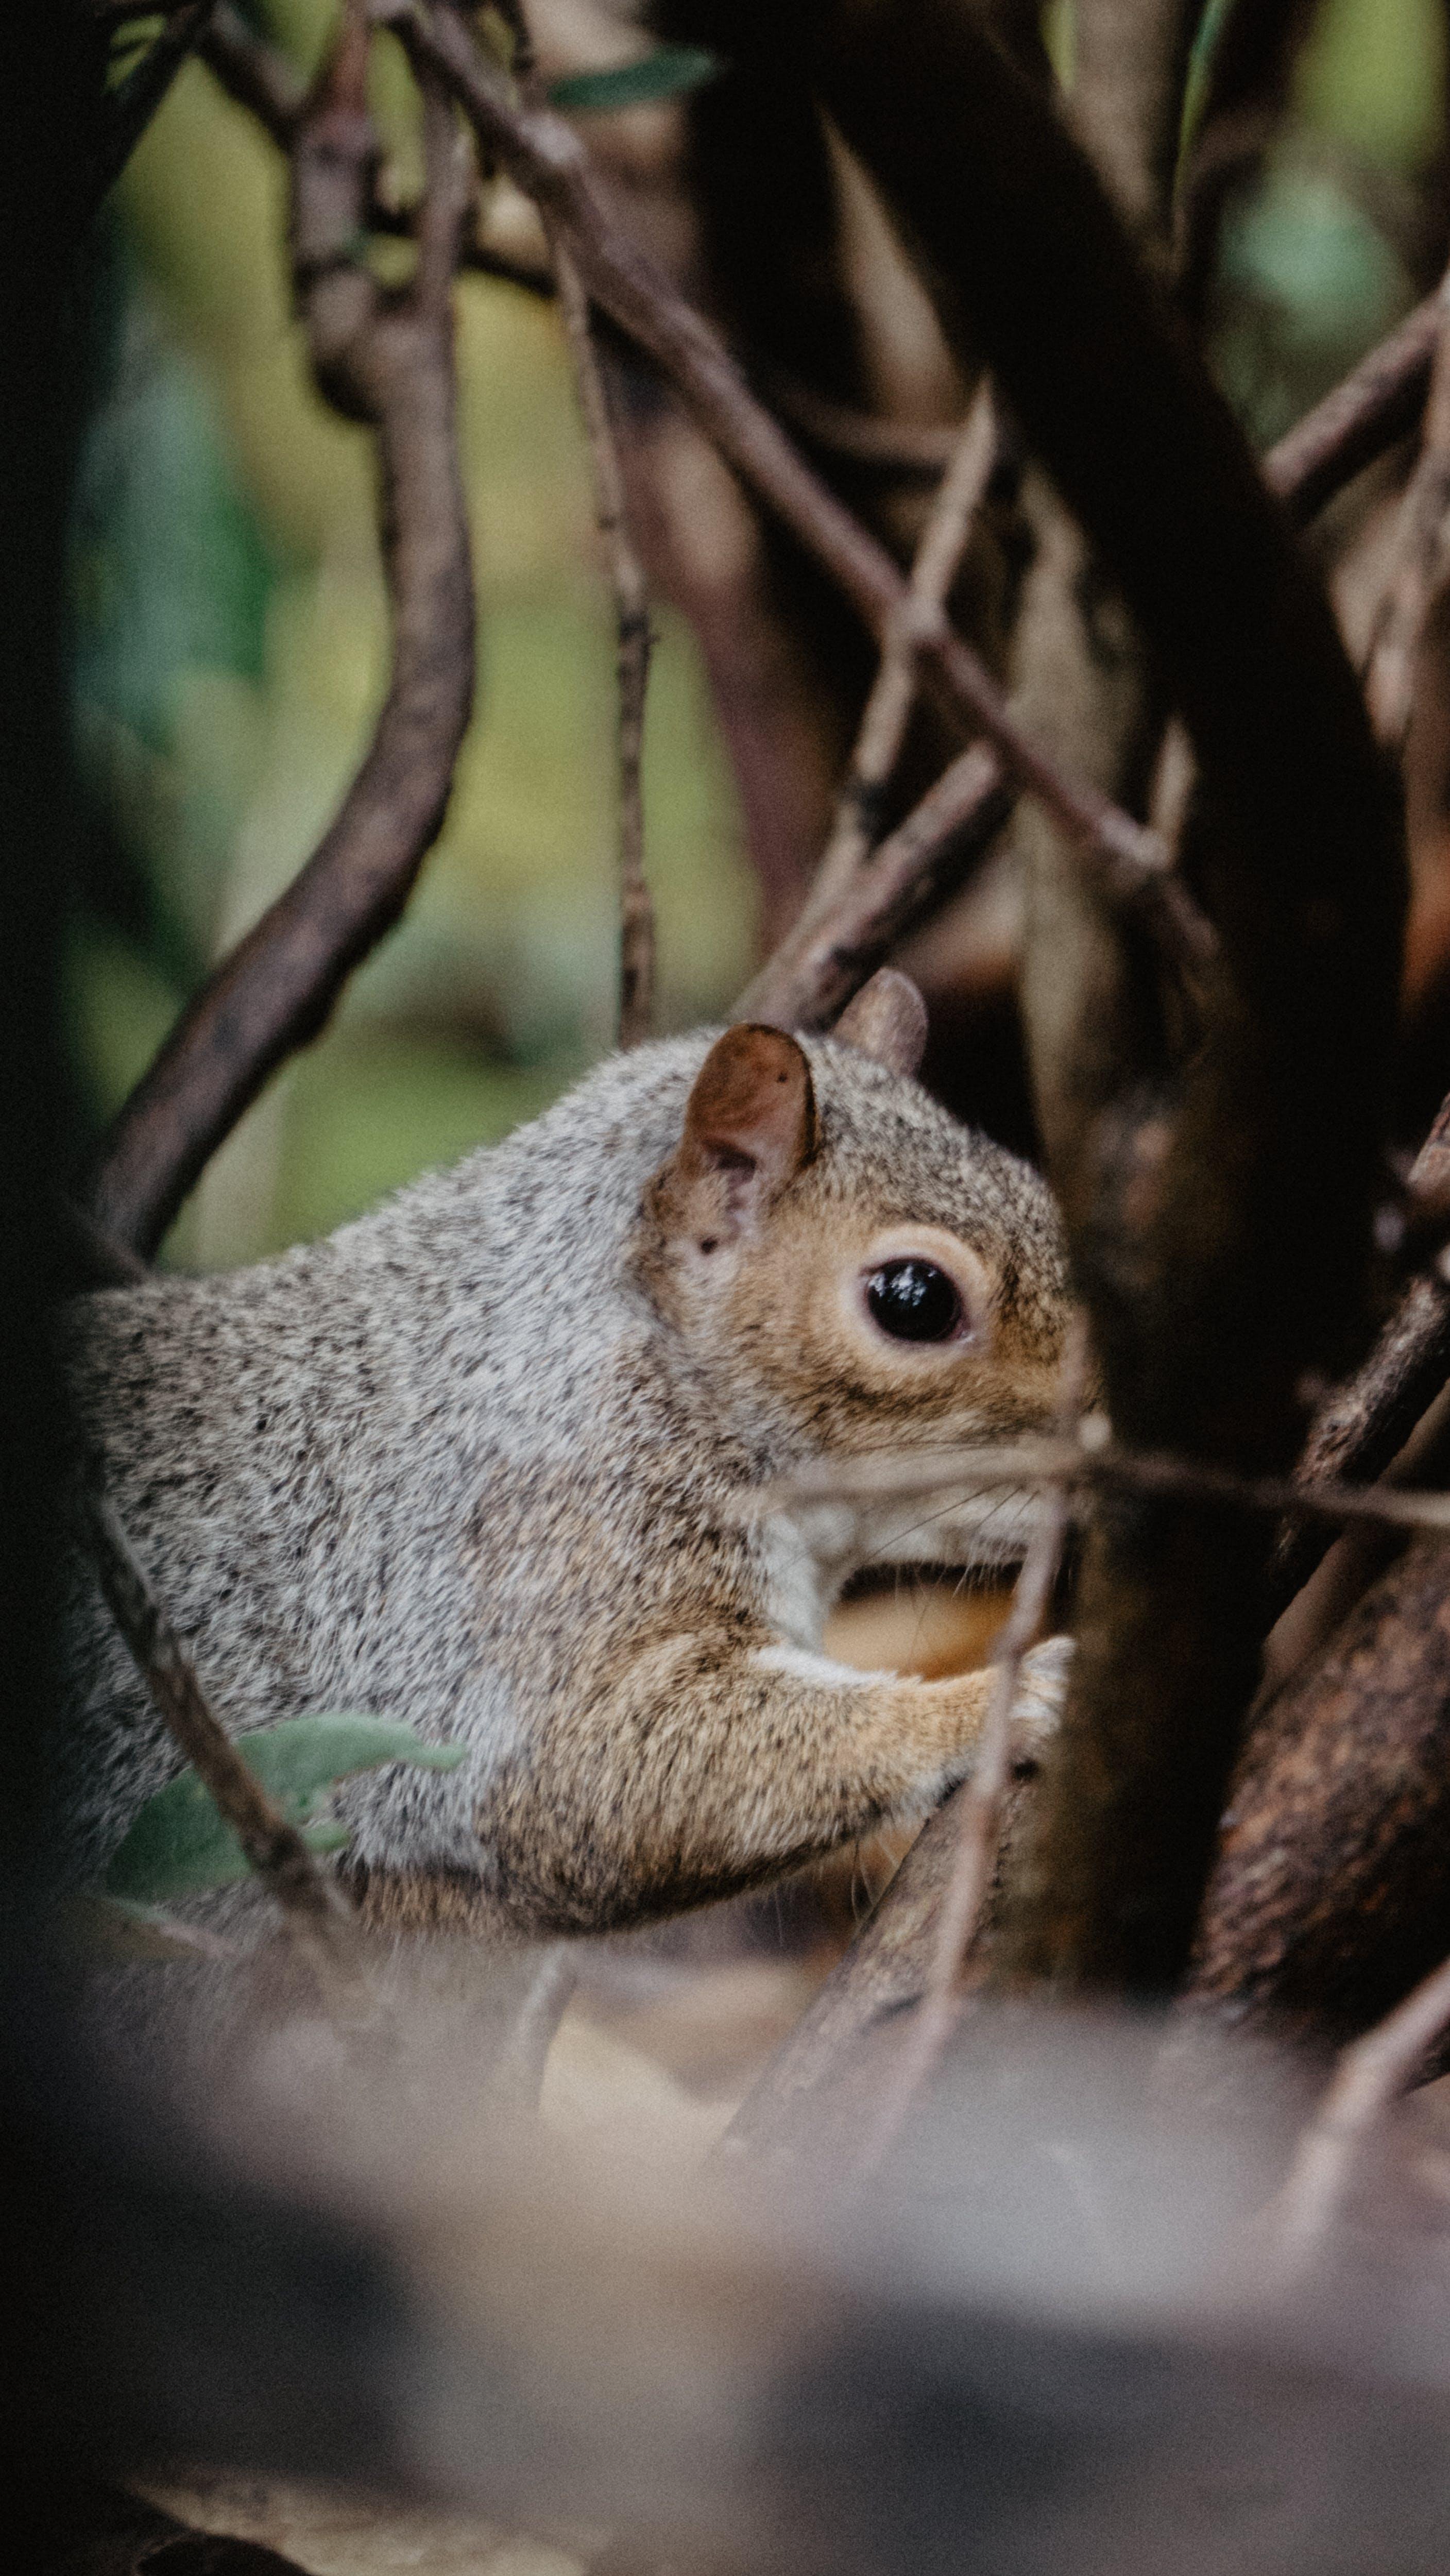 Free stock photo of animals, forest, squirrel, wild animals